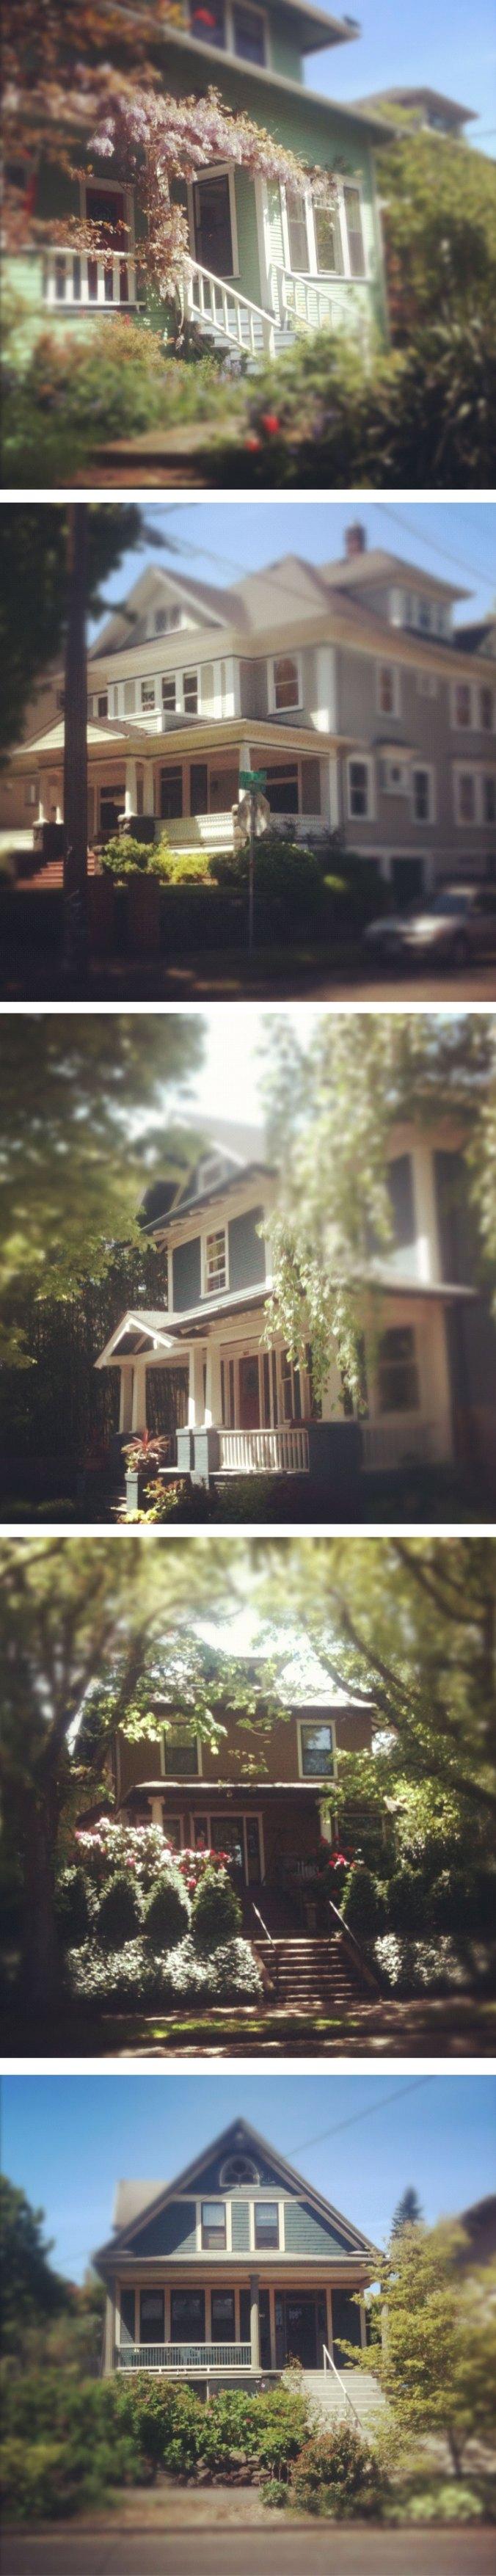 SE PDX Houses